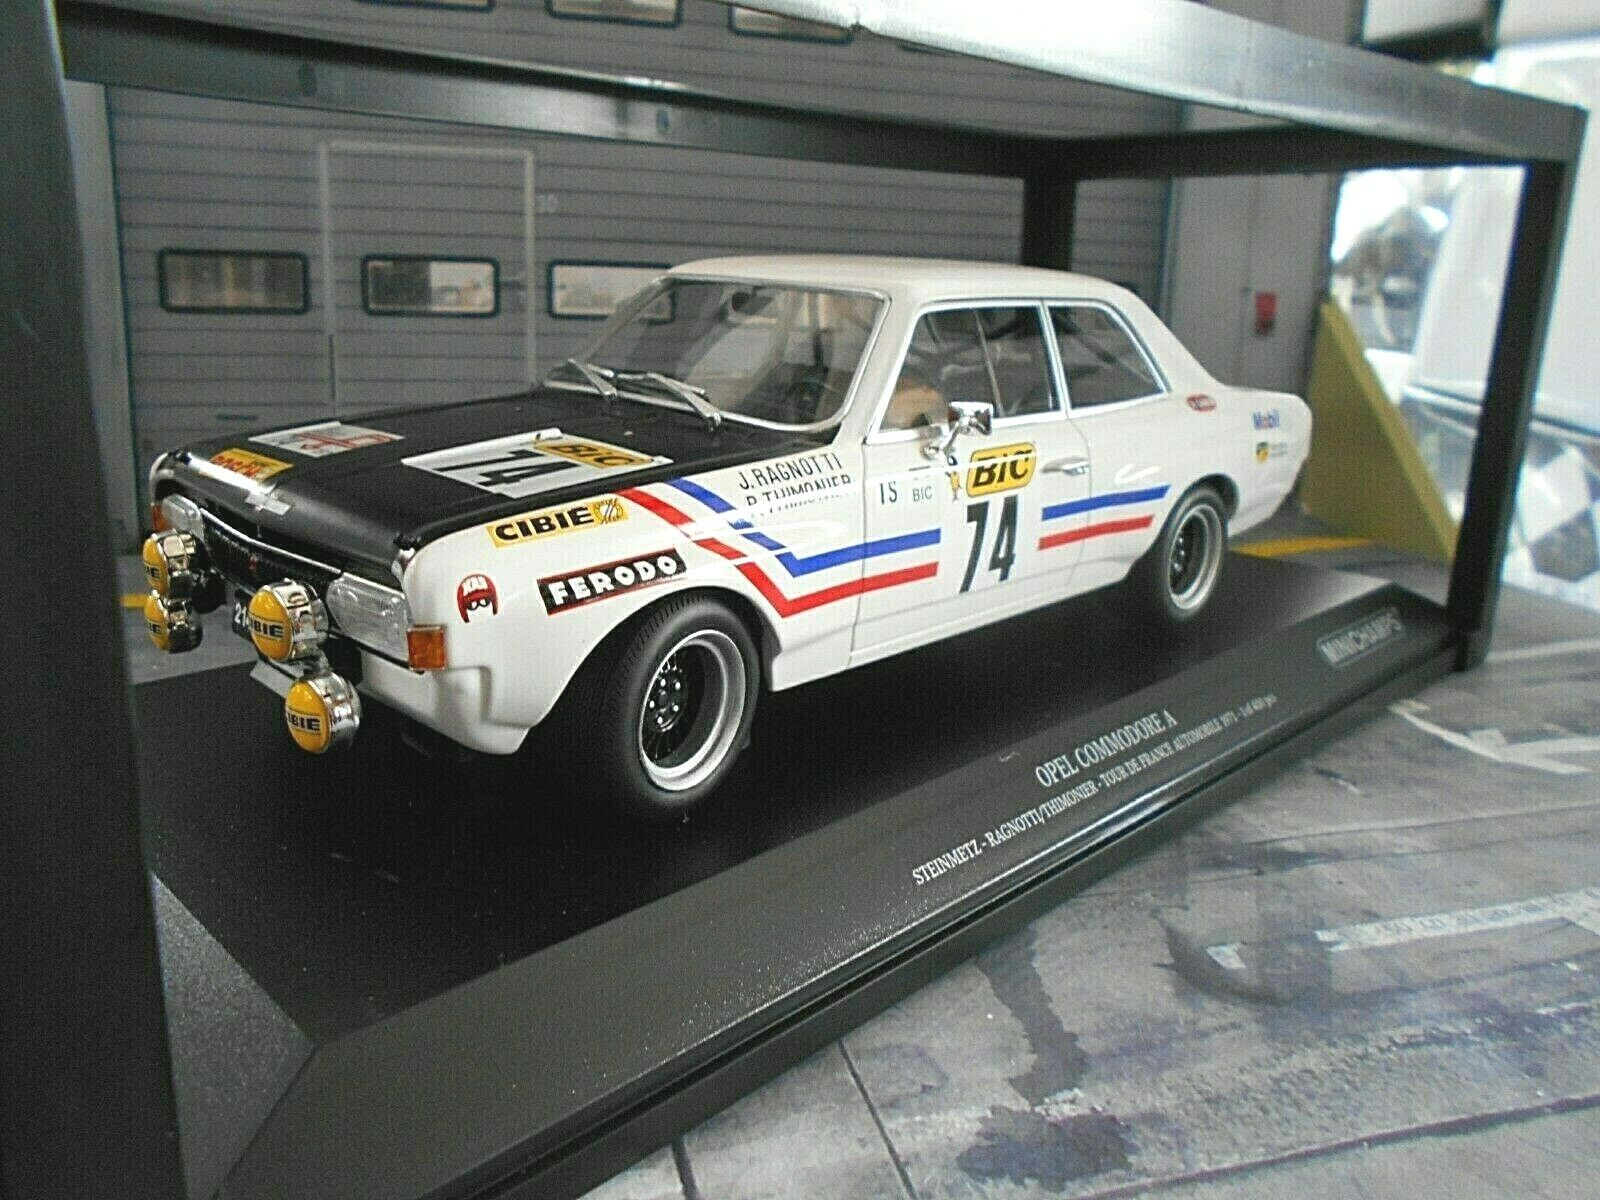 OPEL COMMODORE A PIETRA Metz Rally Tour de France 1971 Ragnotti Minichamps 1 18